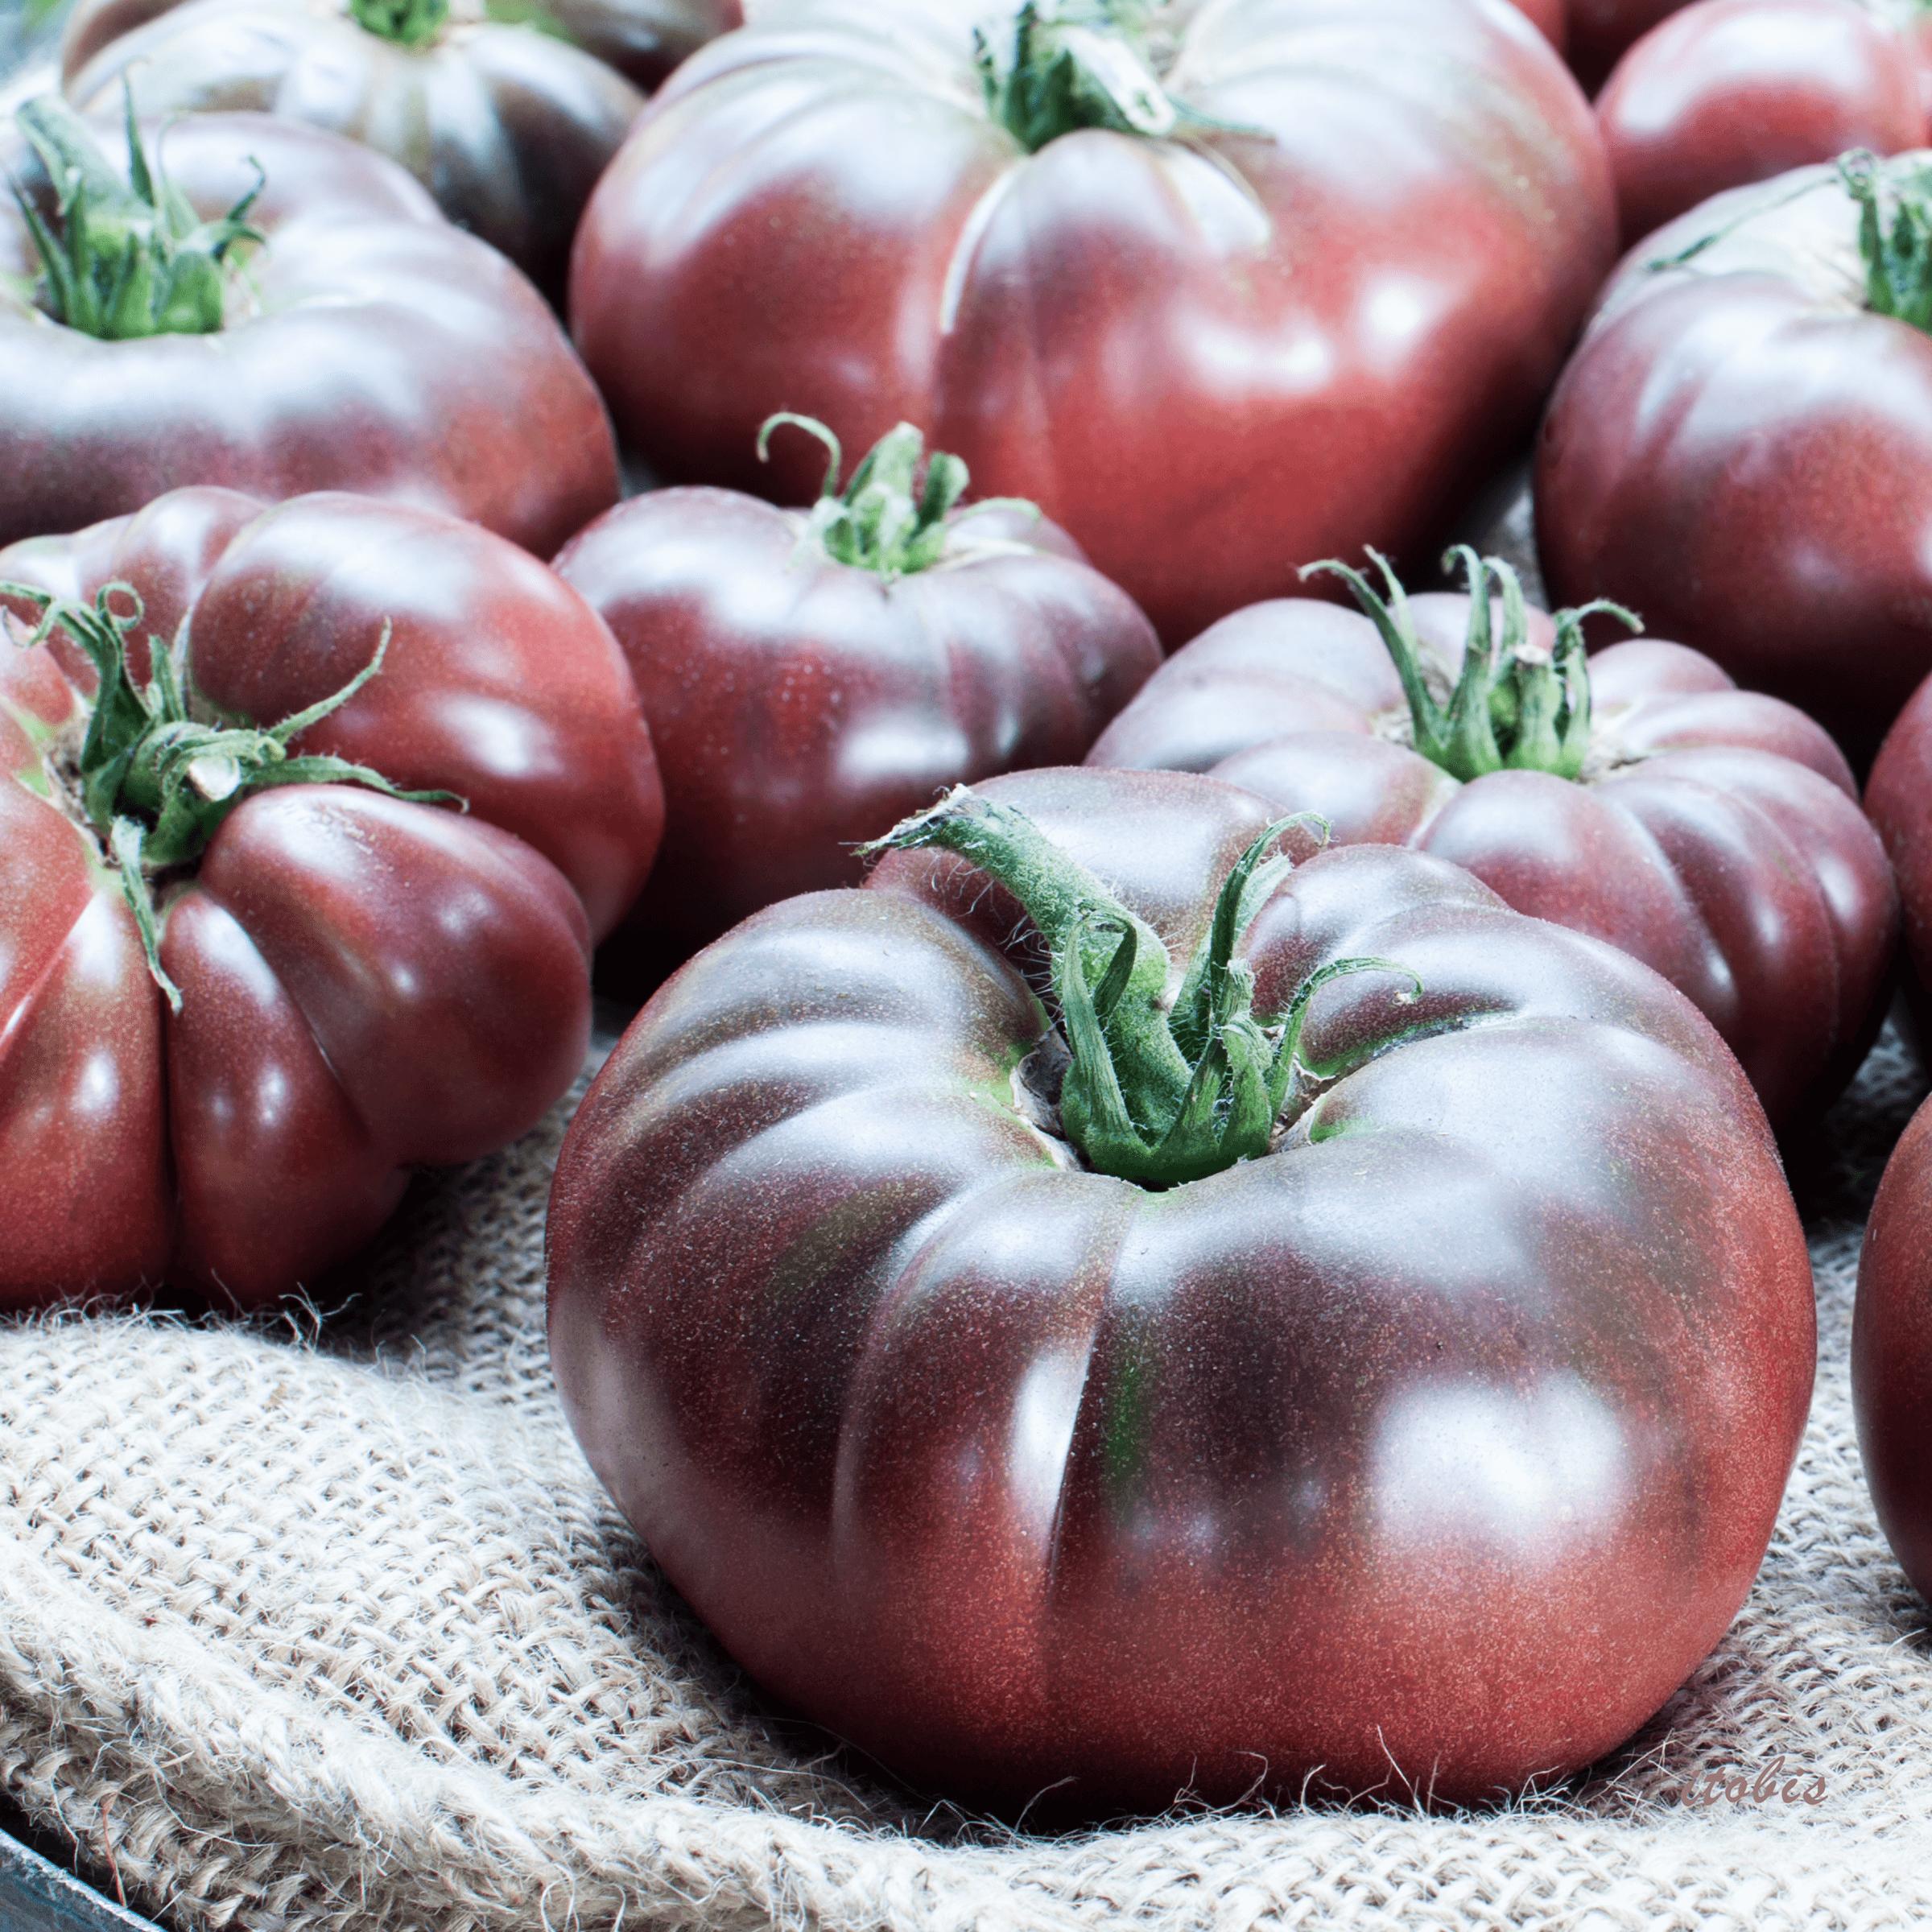 Tomatoes at the Market - Bramble Lea Farm - Beechwood Farmers' Market, Ottawa, Ontario - photo by Irene Tobis